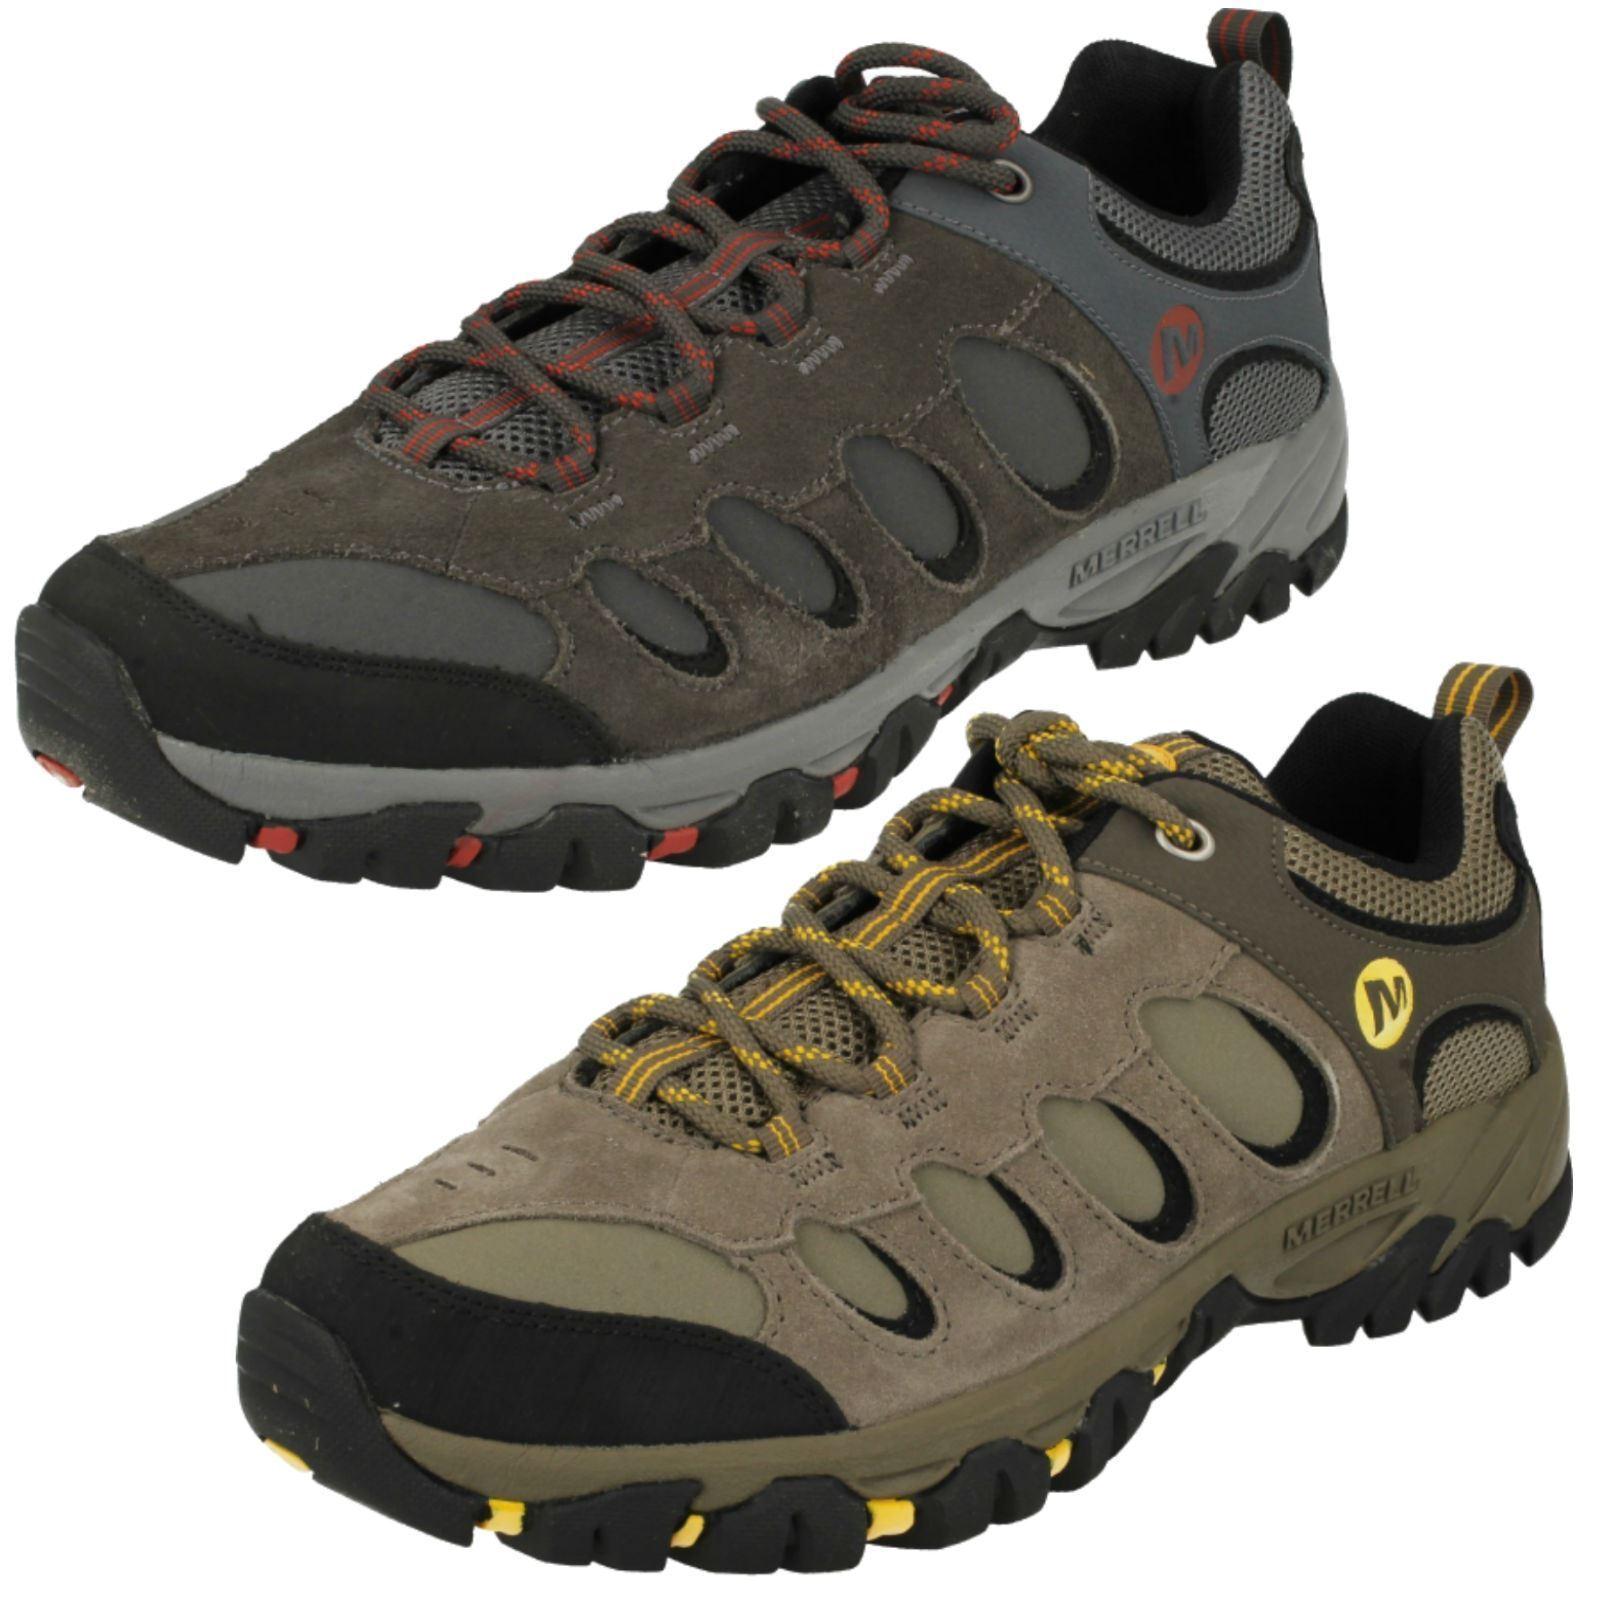 Para HOMBRE MERRELL ridgepass Perno De Cuero Con Cordones Caminar Senderismo Zapatillas Zapatos